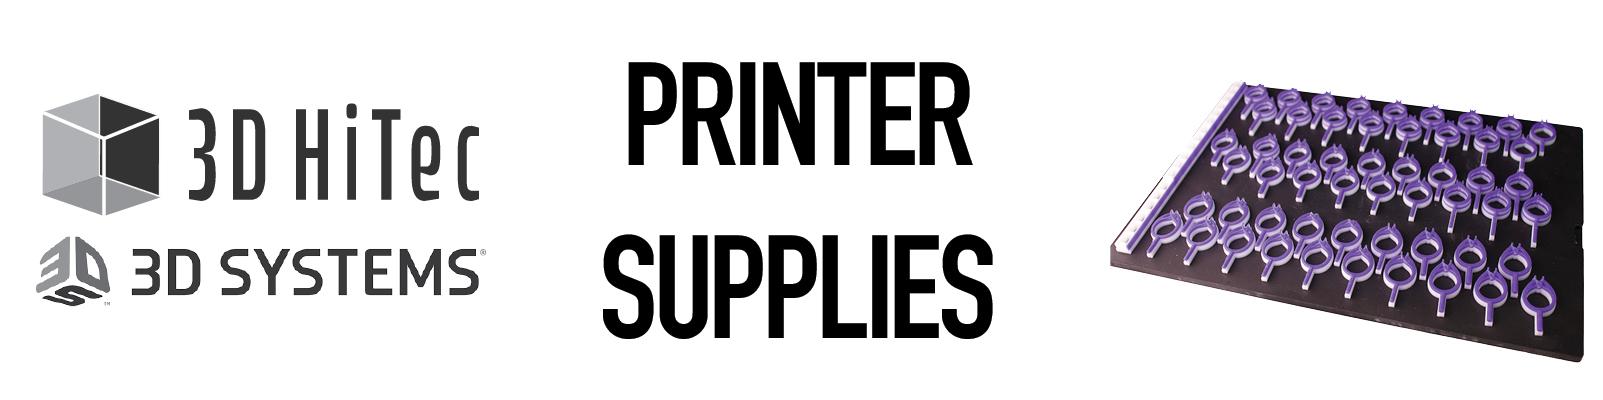 3D Systems Printer Supplies